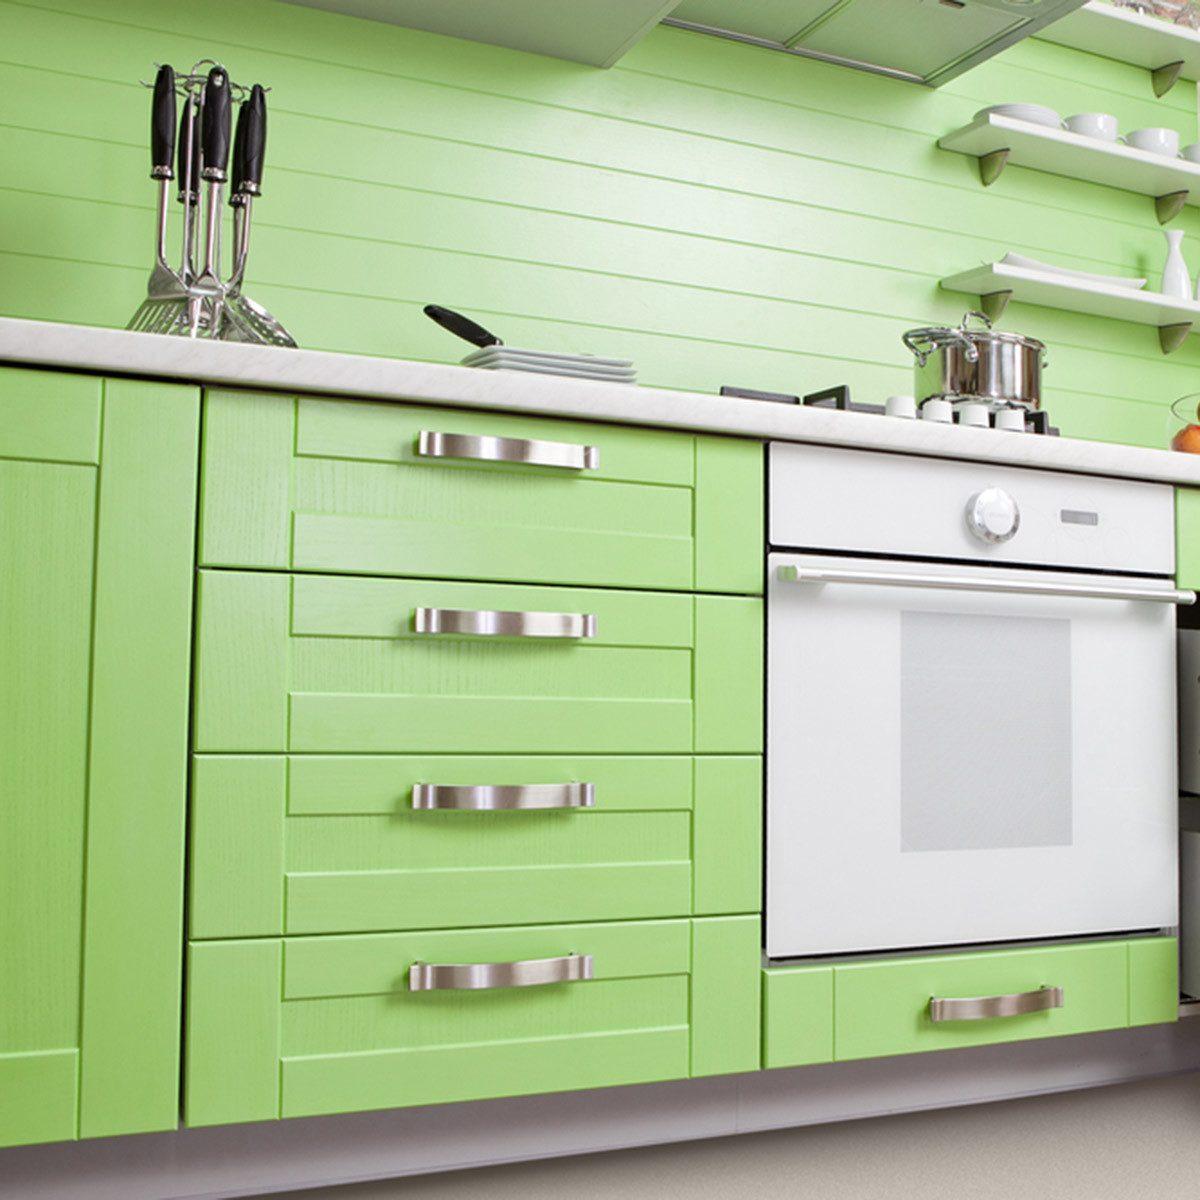 Popular Kitchen Cabinet Colors: Farmhouse Green